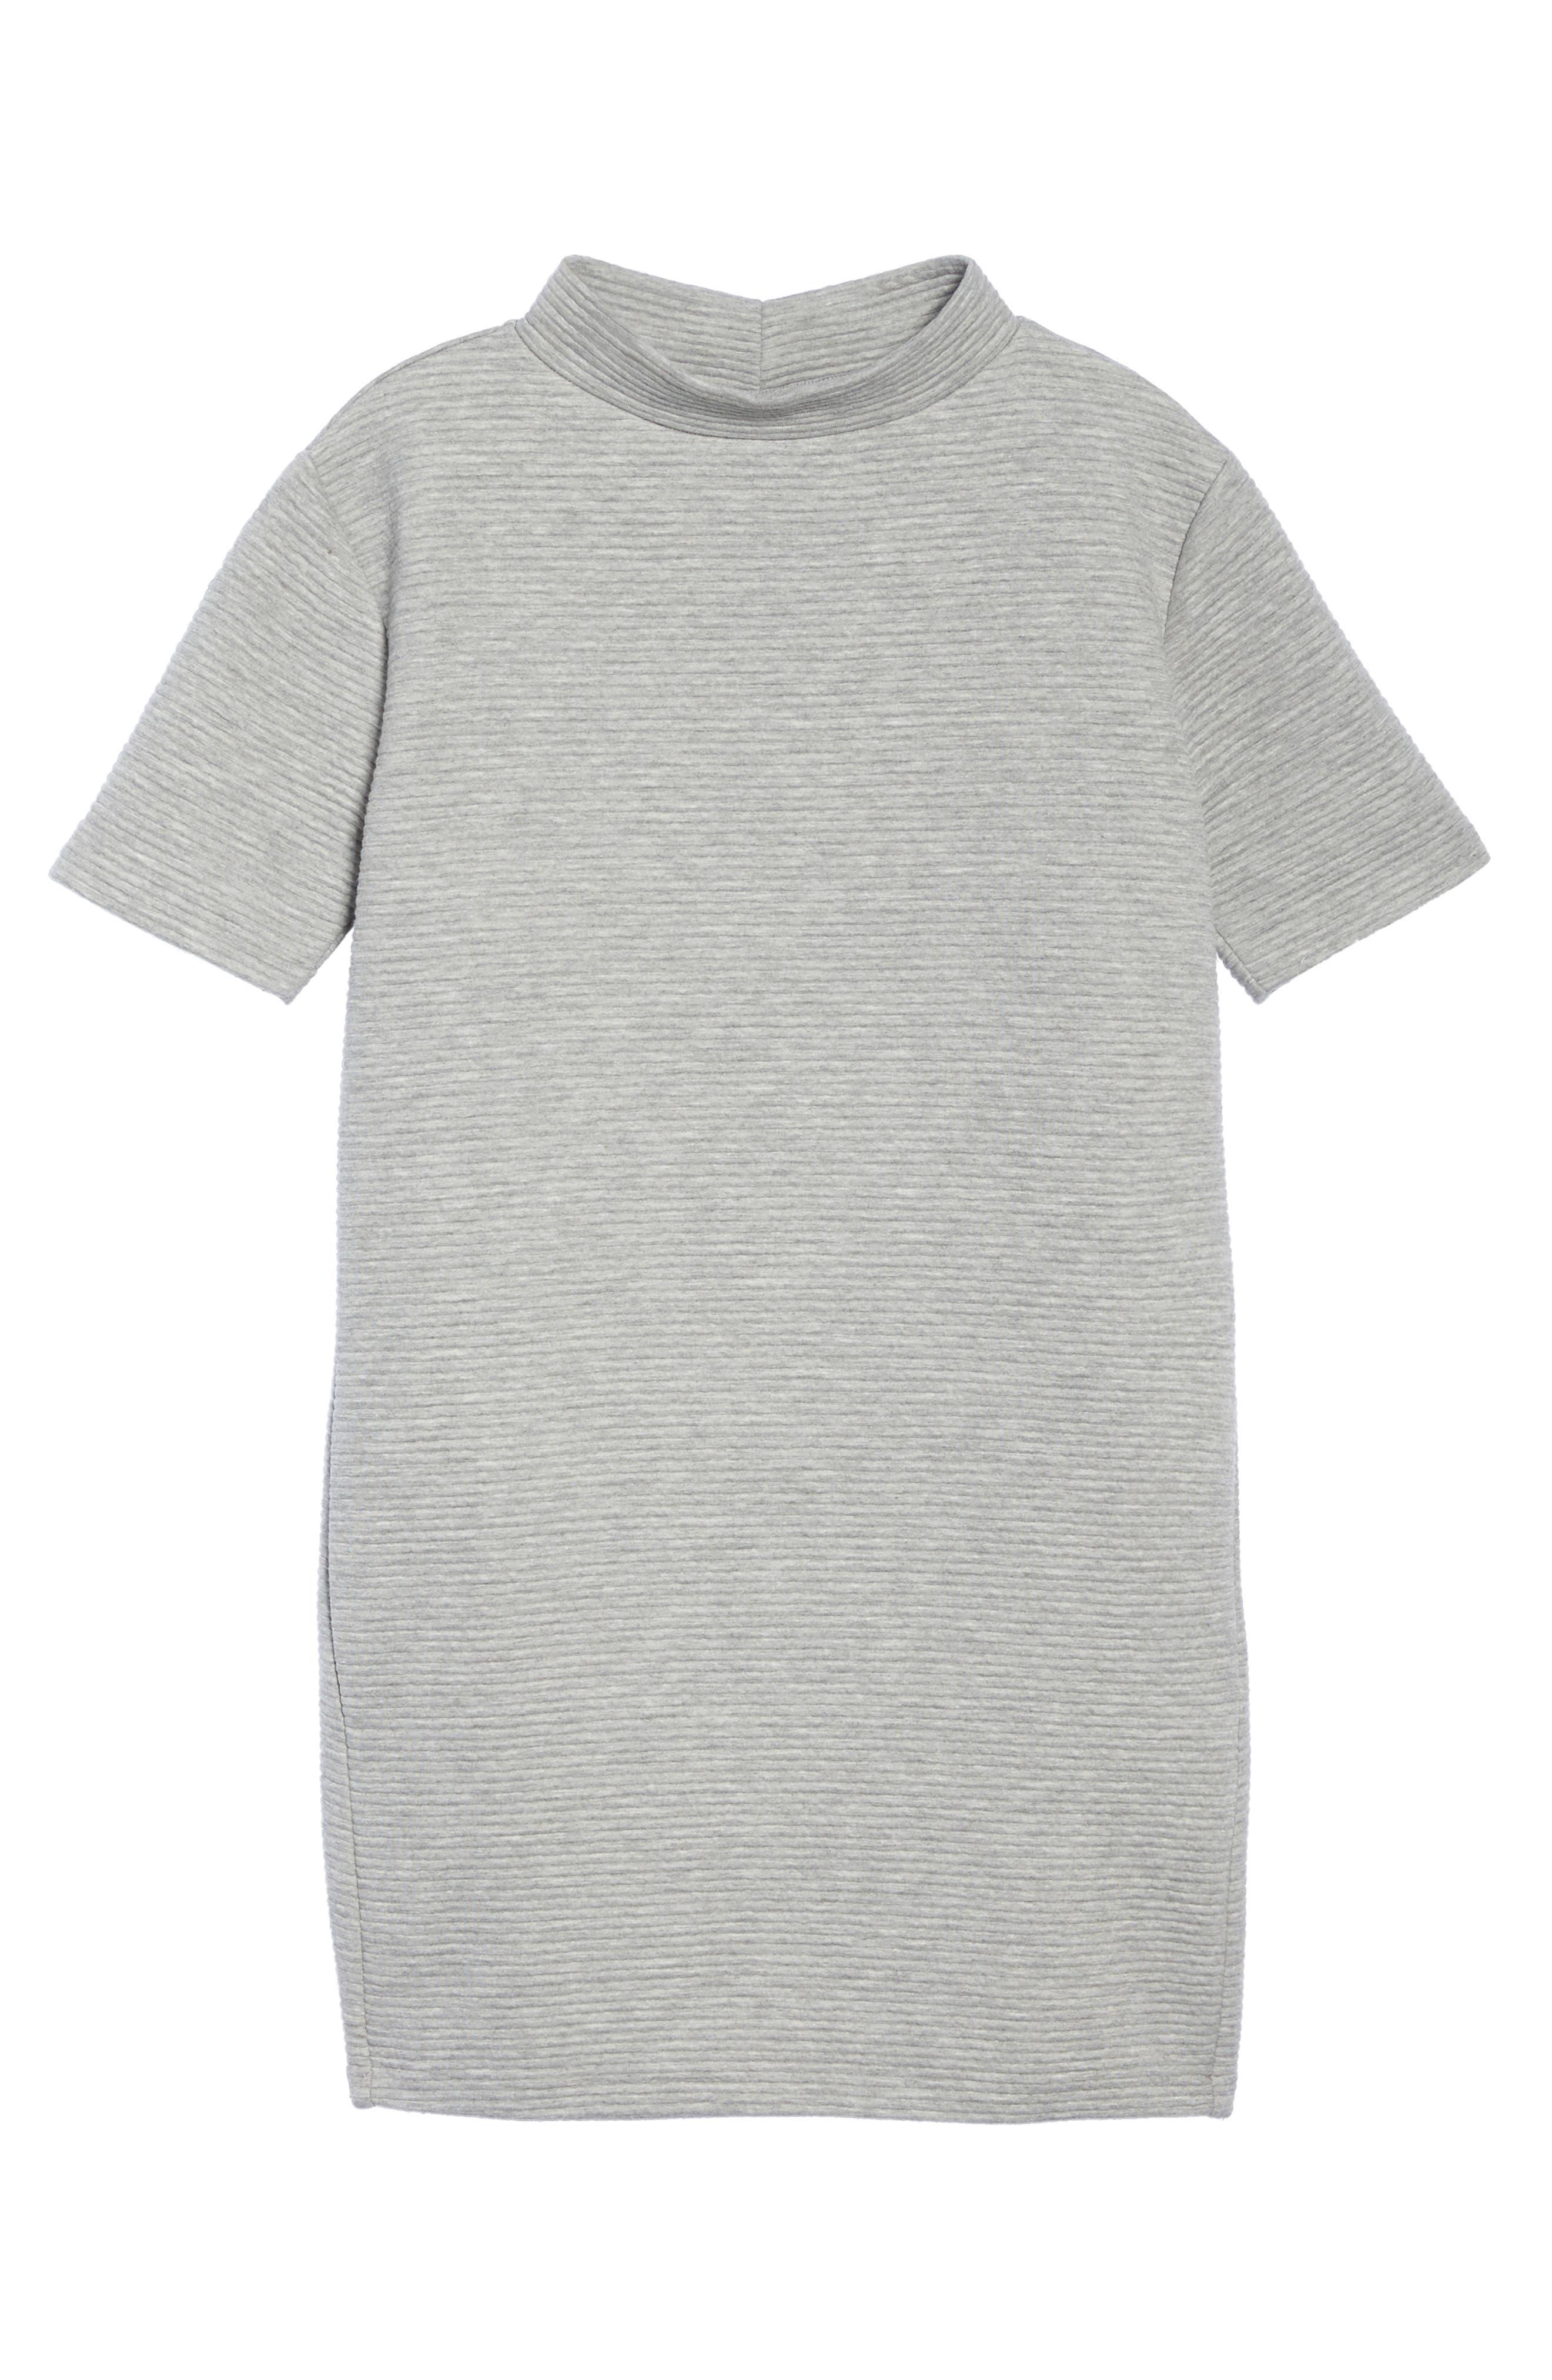 Marian Shift Dress,                         Main,                         color, Light Grey